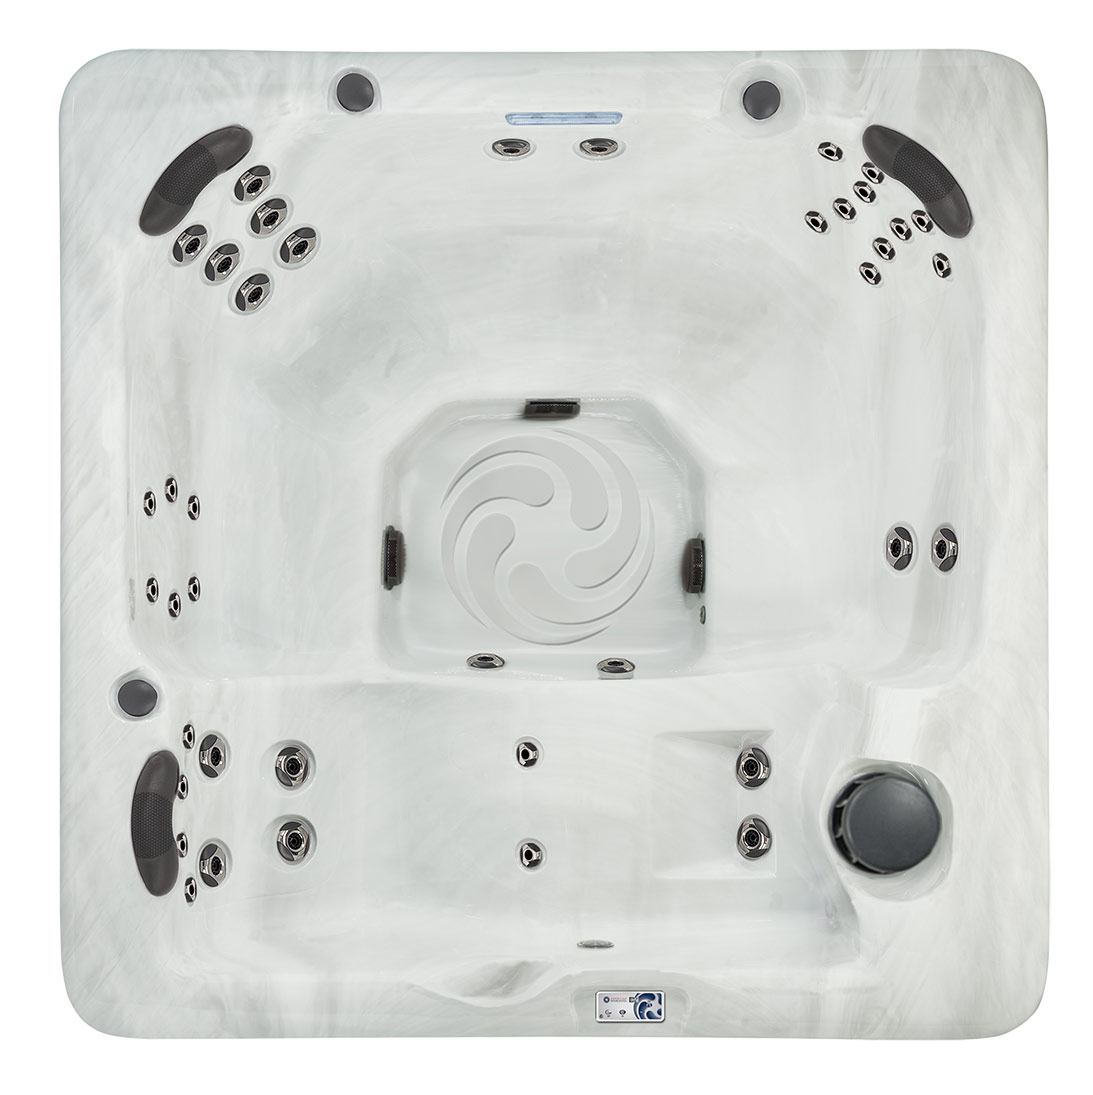 AW 171 Hot Tub